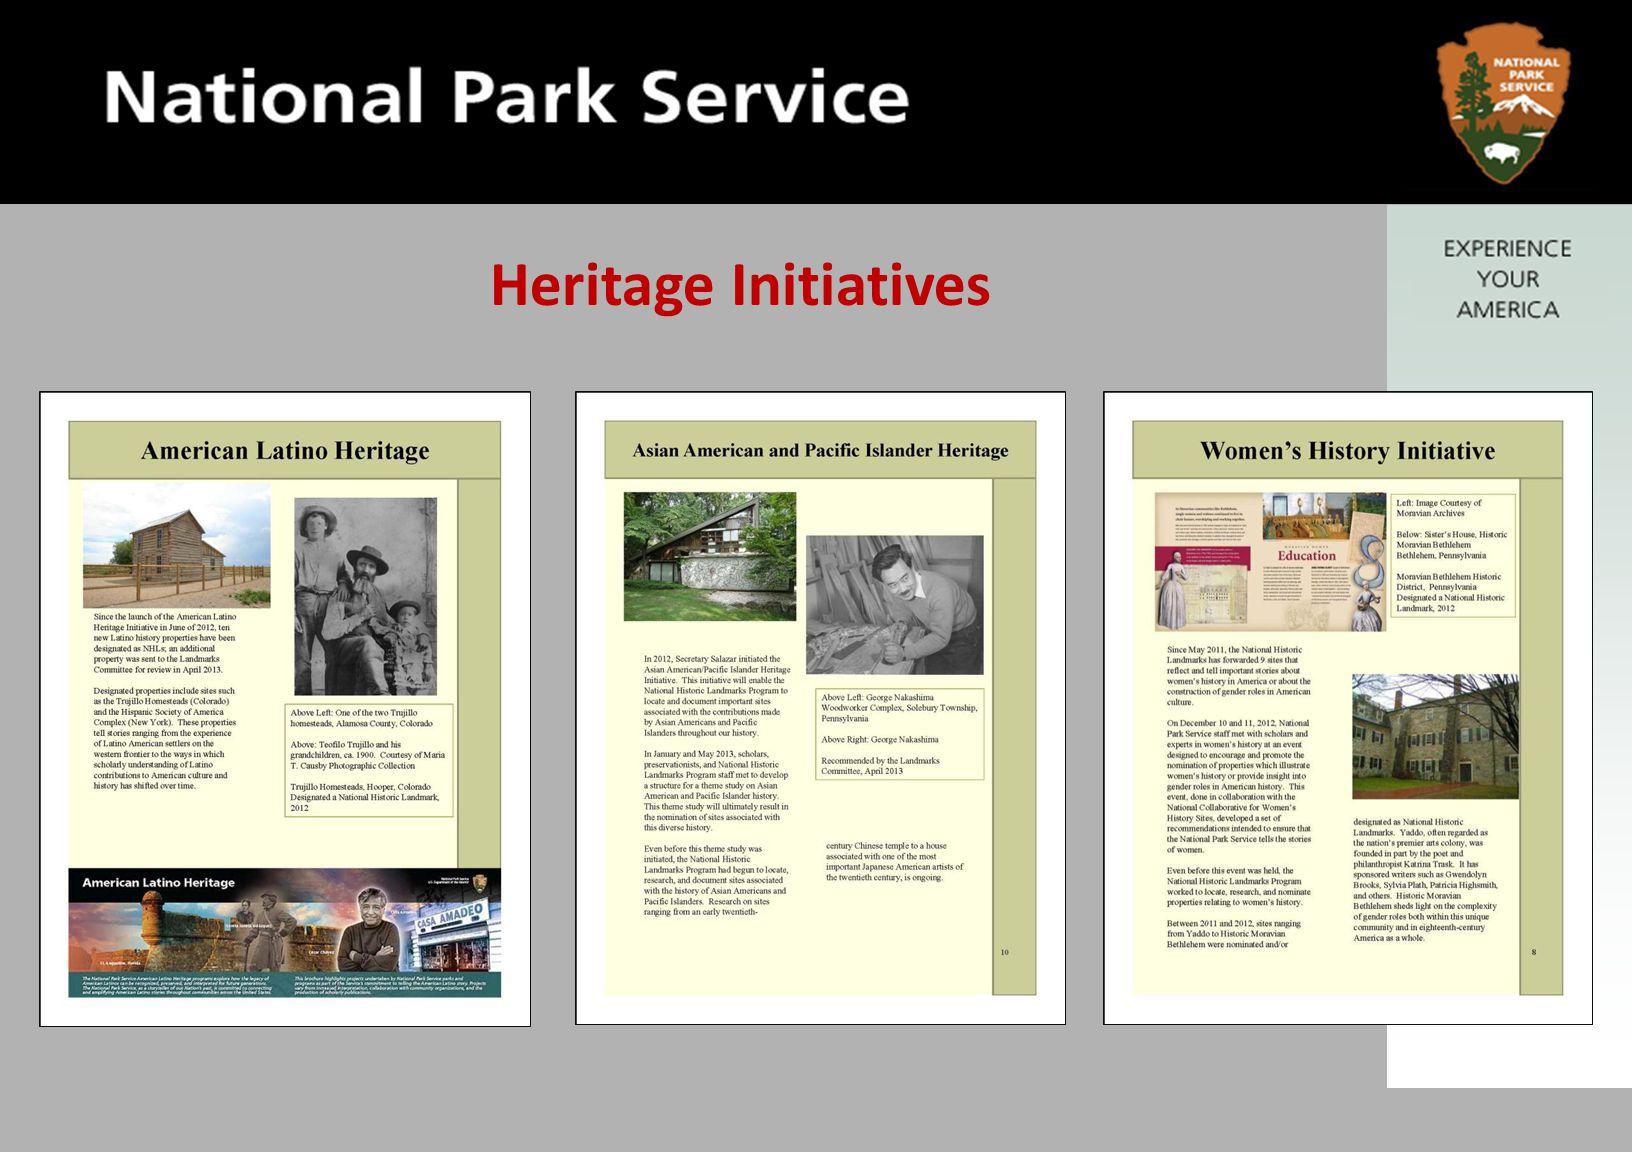 Heritage Initiatives